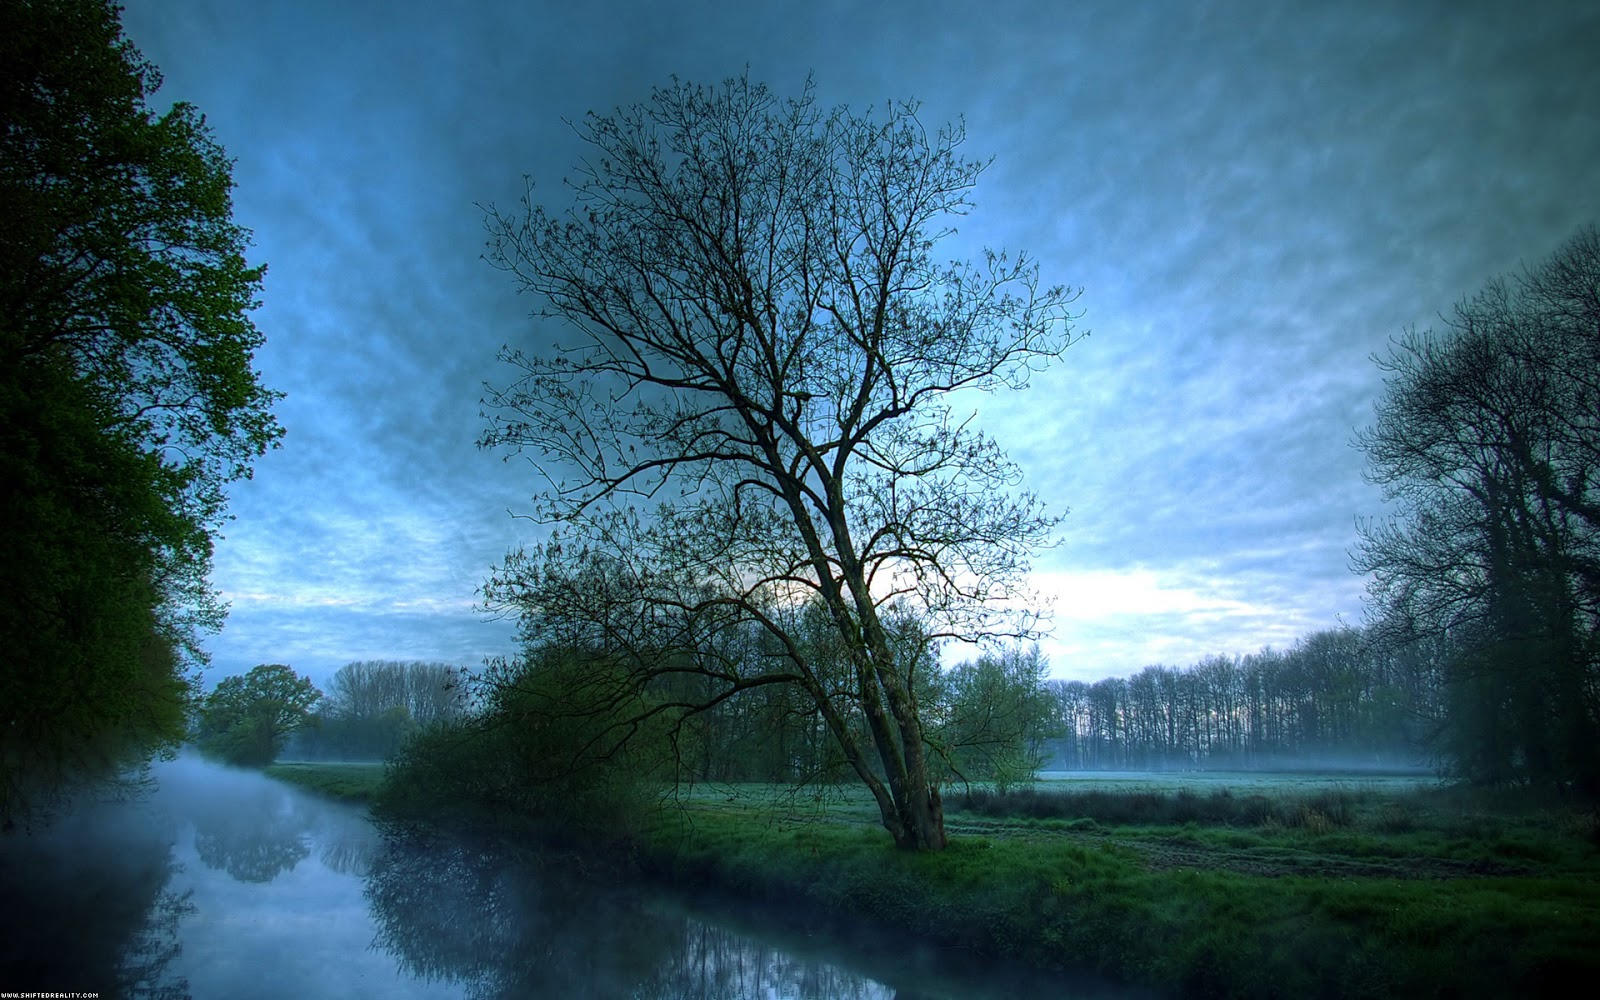 nature wallpaper hd desktop free download - just for sharing